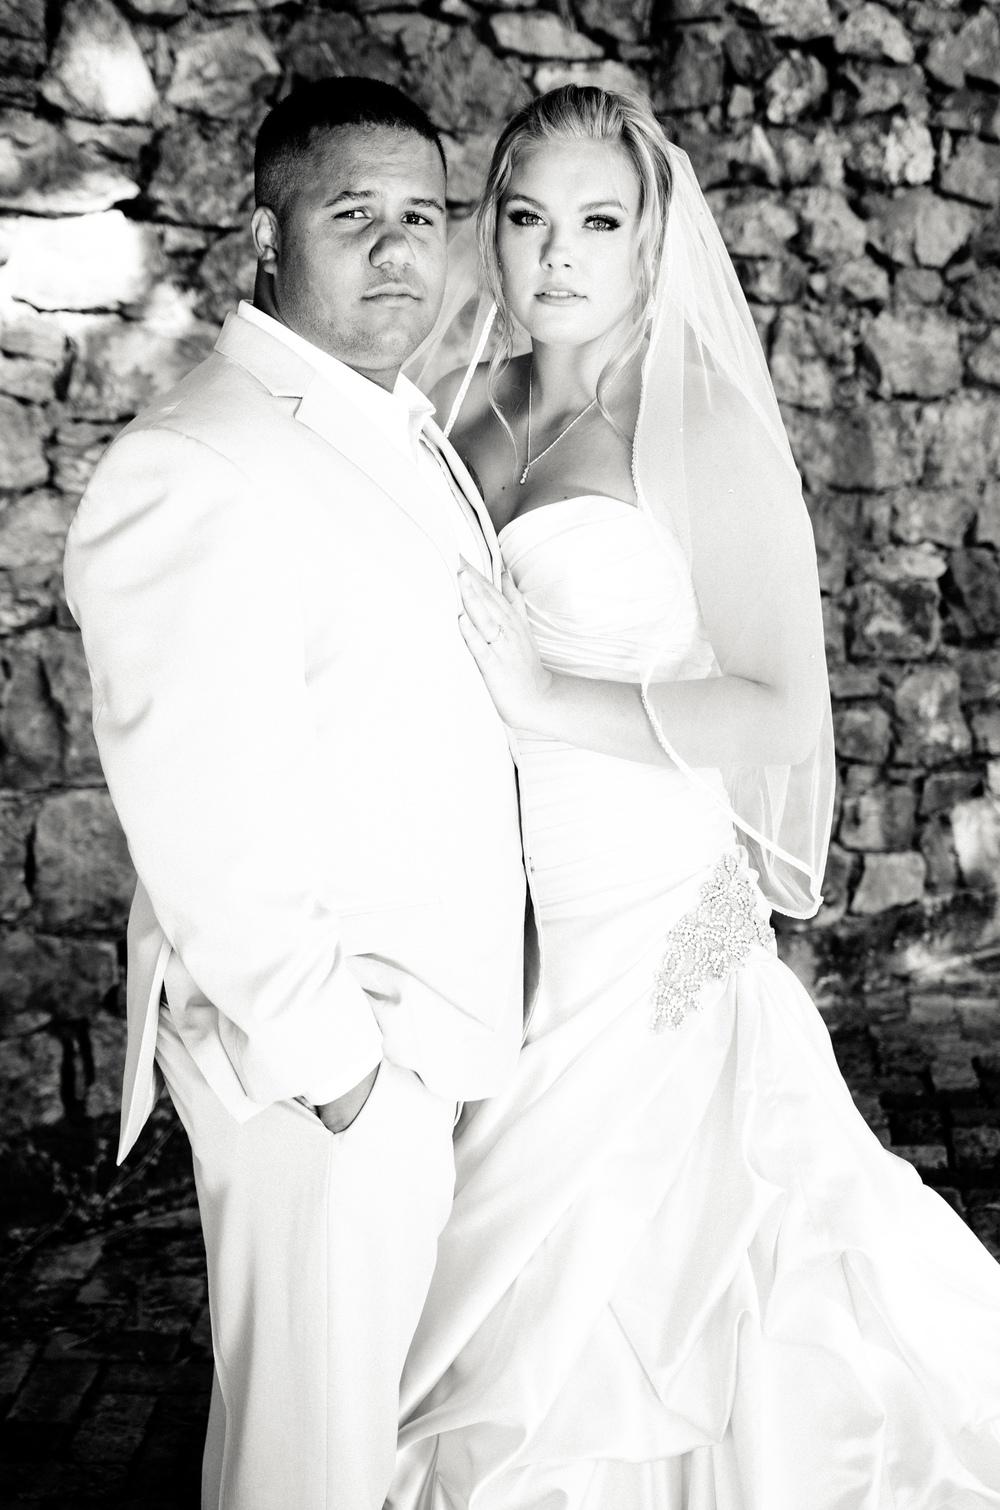 Moultrie-5.jpg